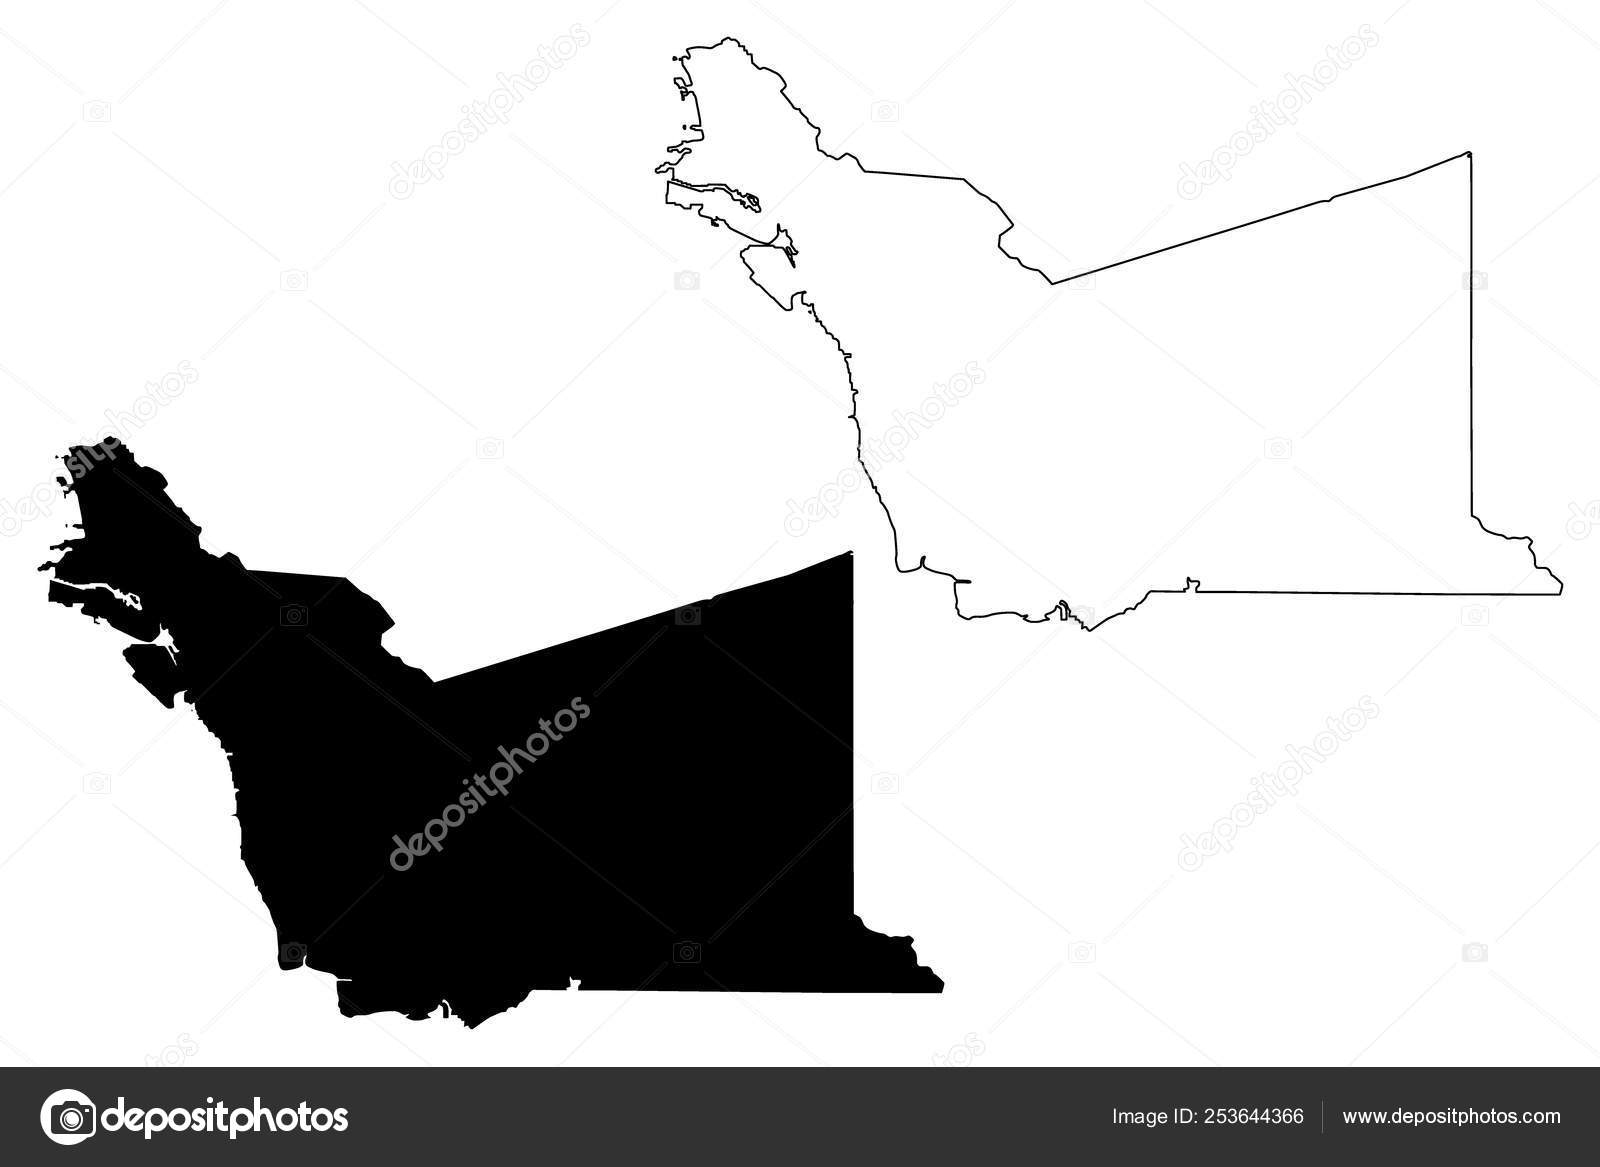 Counties In California Map.Alameda County California Map Vector Stock Vector C Danler 253644366